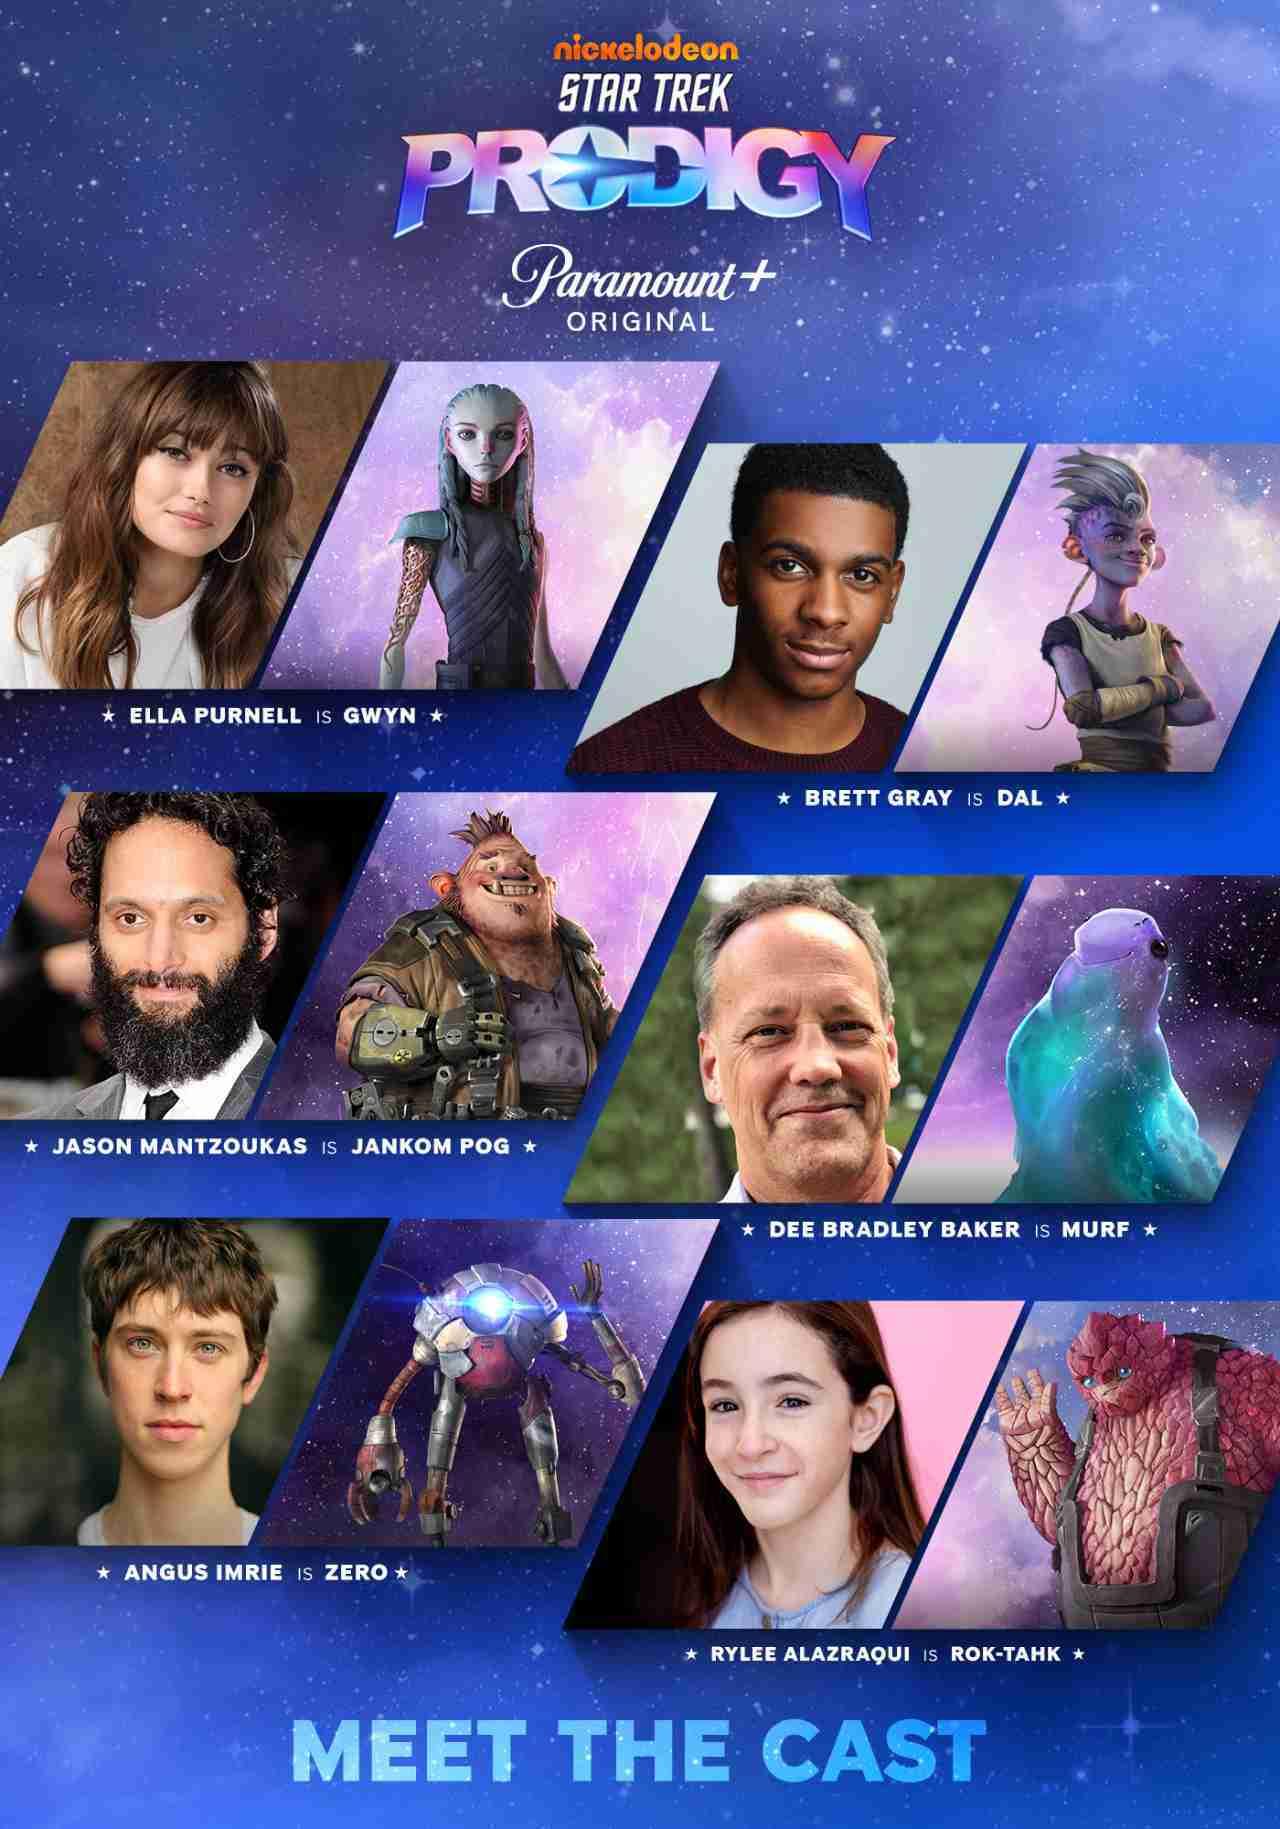 Star Trek Prodigy Cast